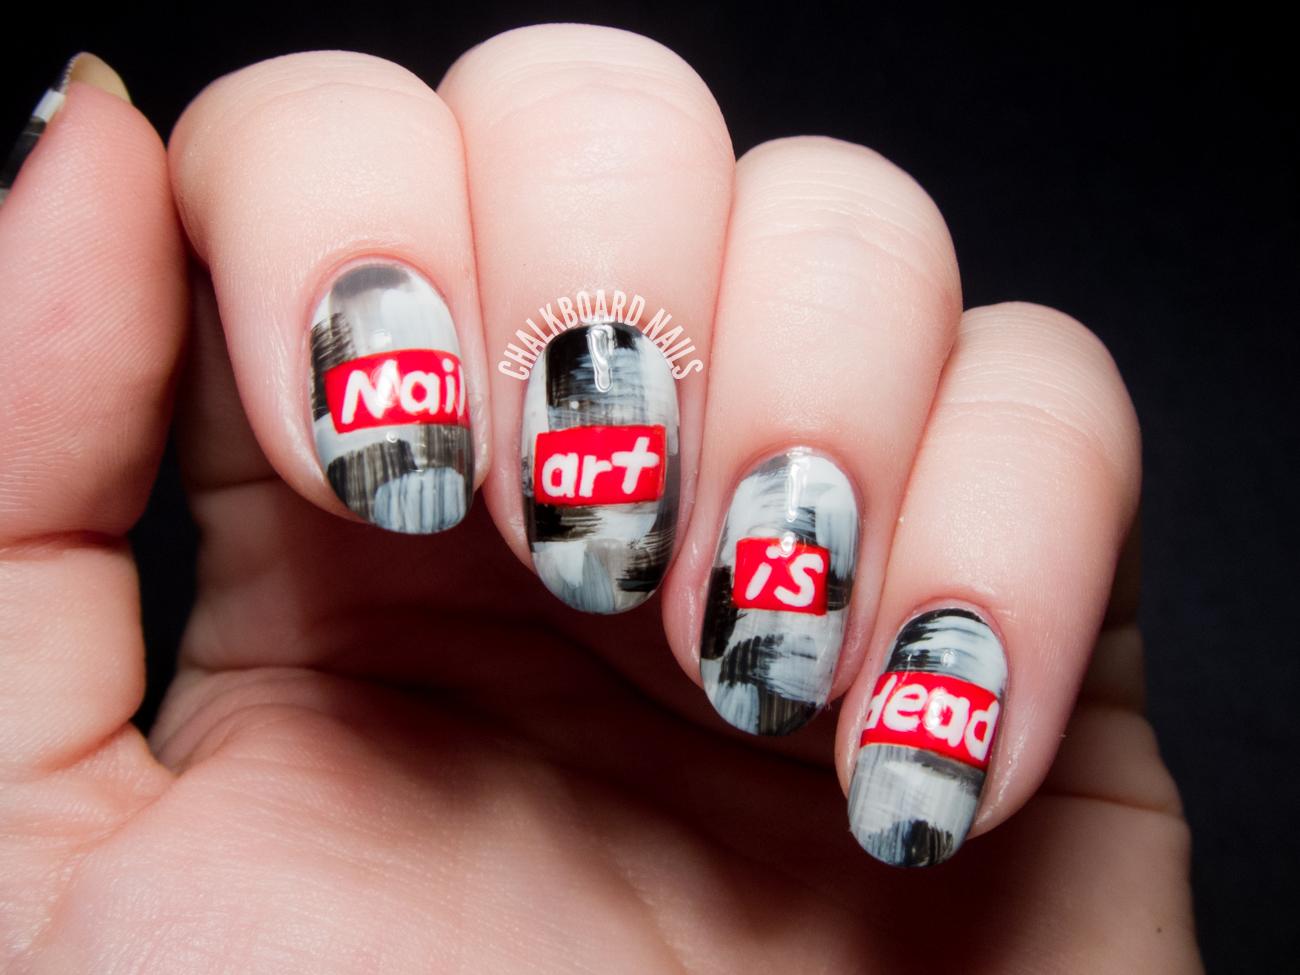 Barbara Kruger inspired nail art by @chalkboardnails